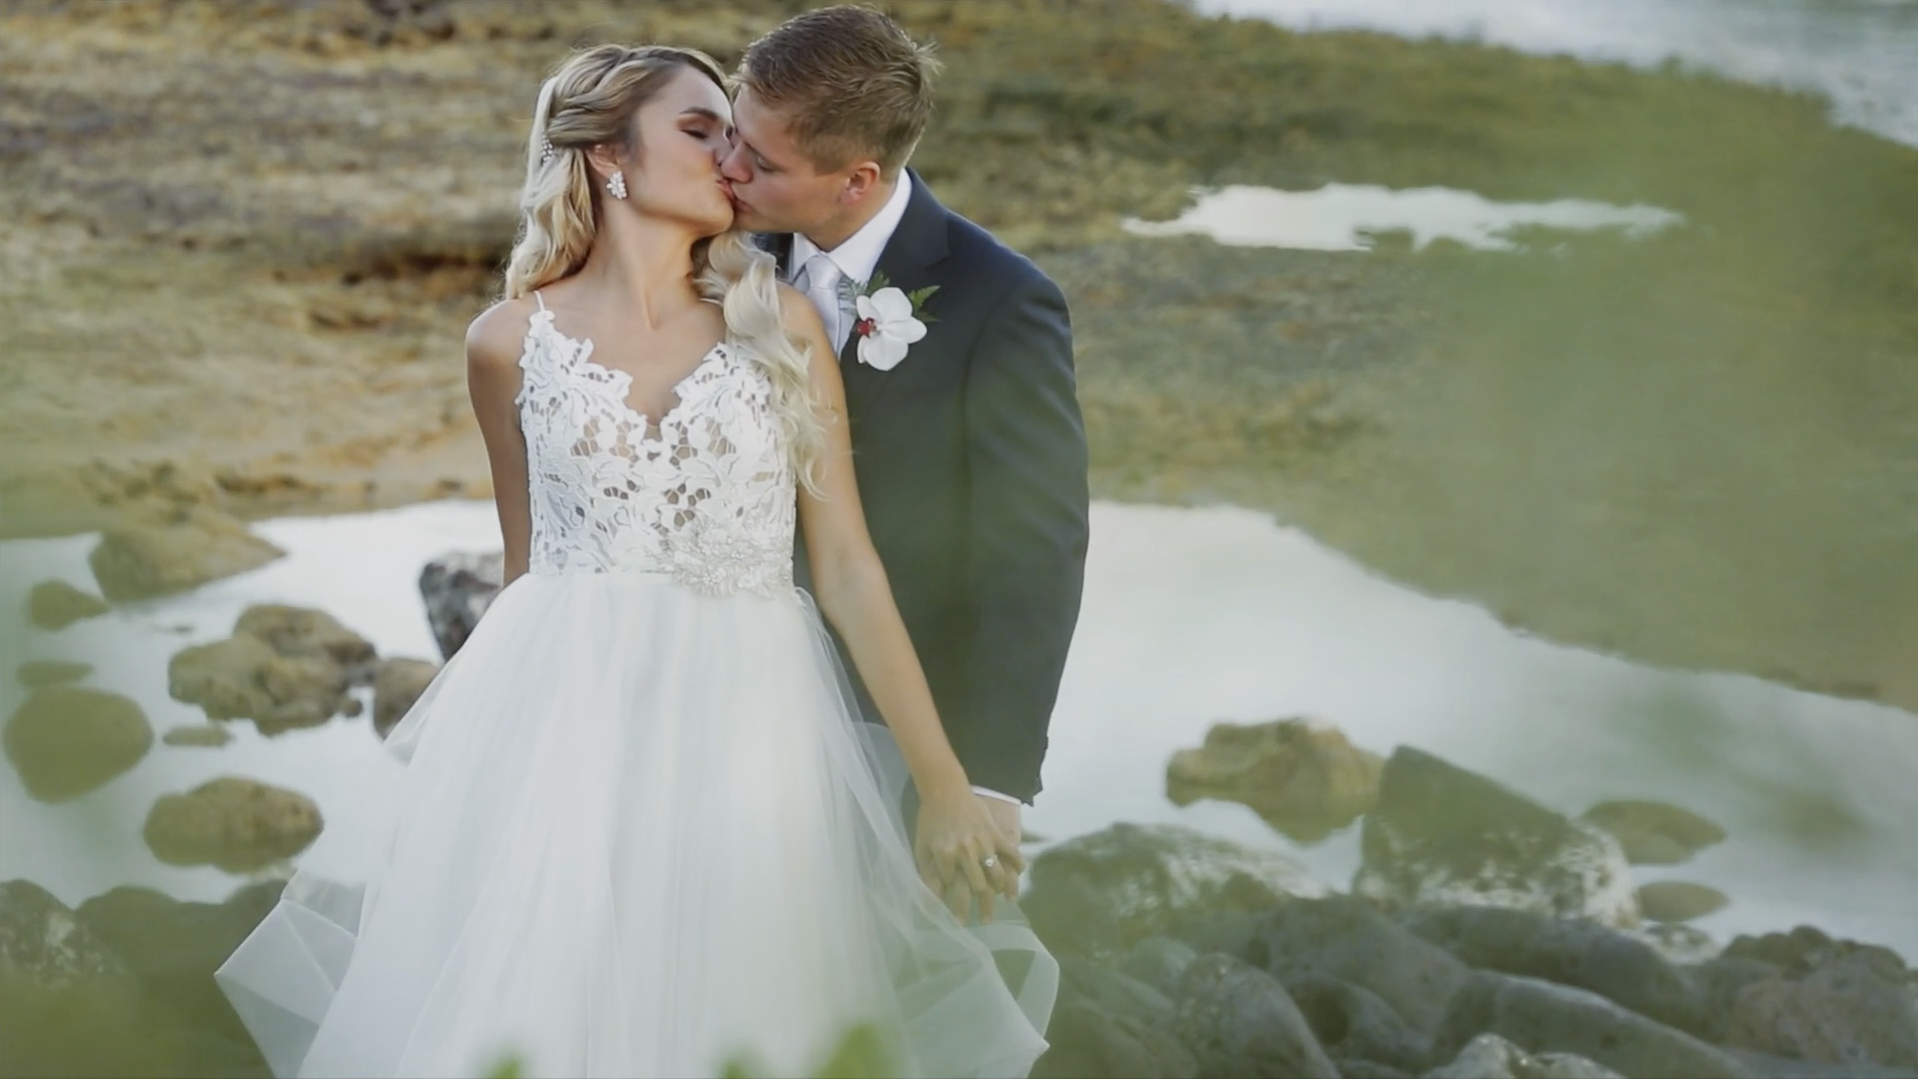 Beach Wedding on Kauai, Hawaii // Grand Hyatt Weddings Kauai